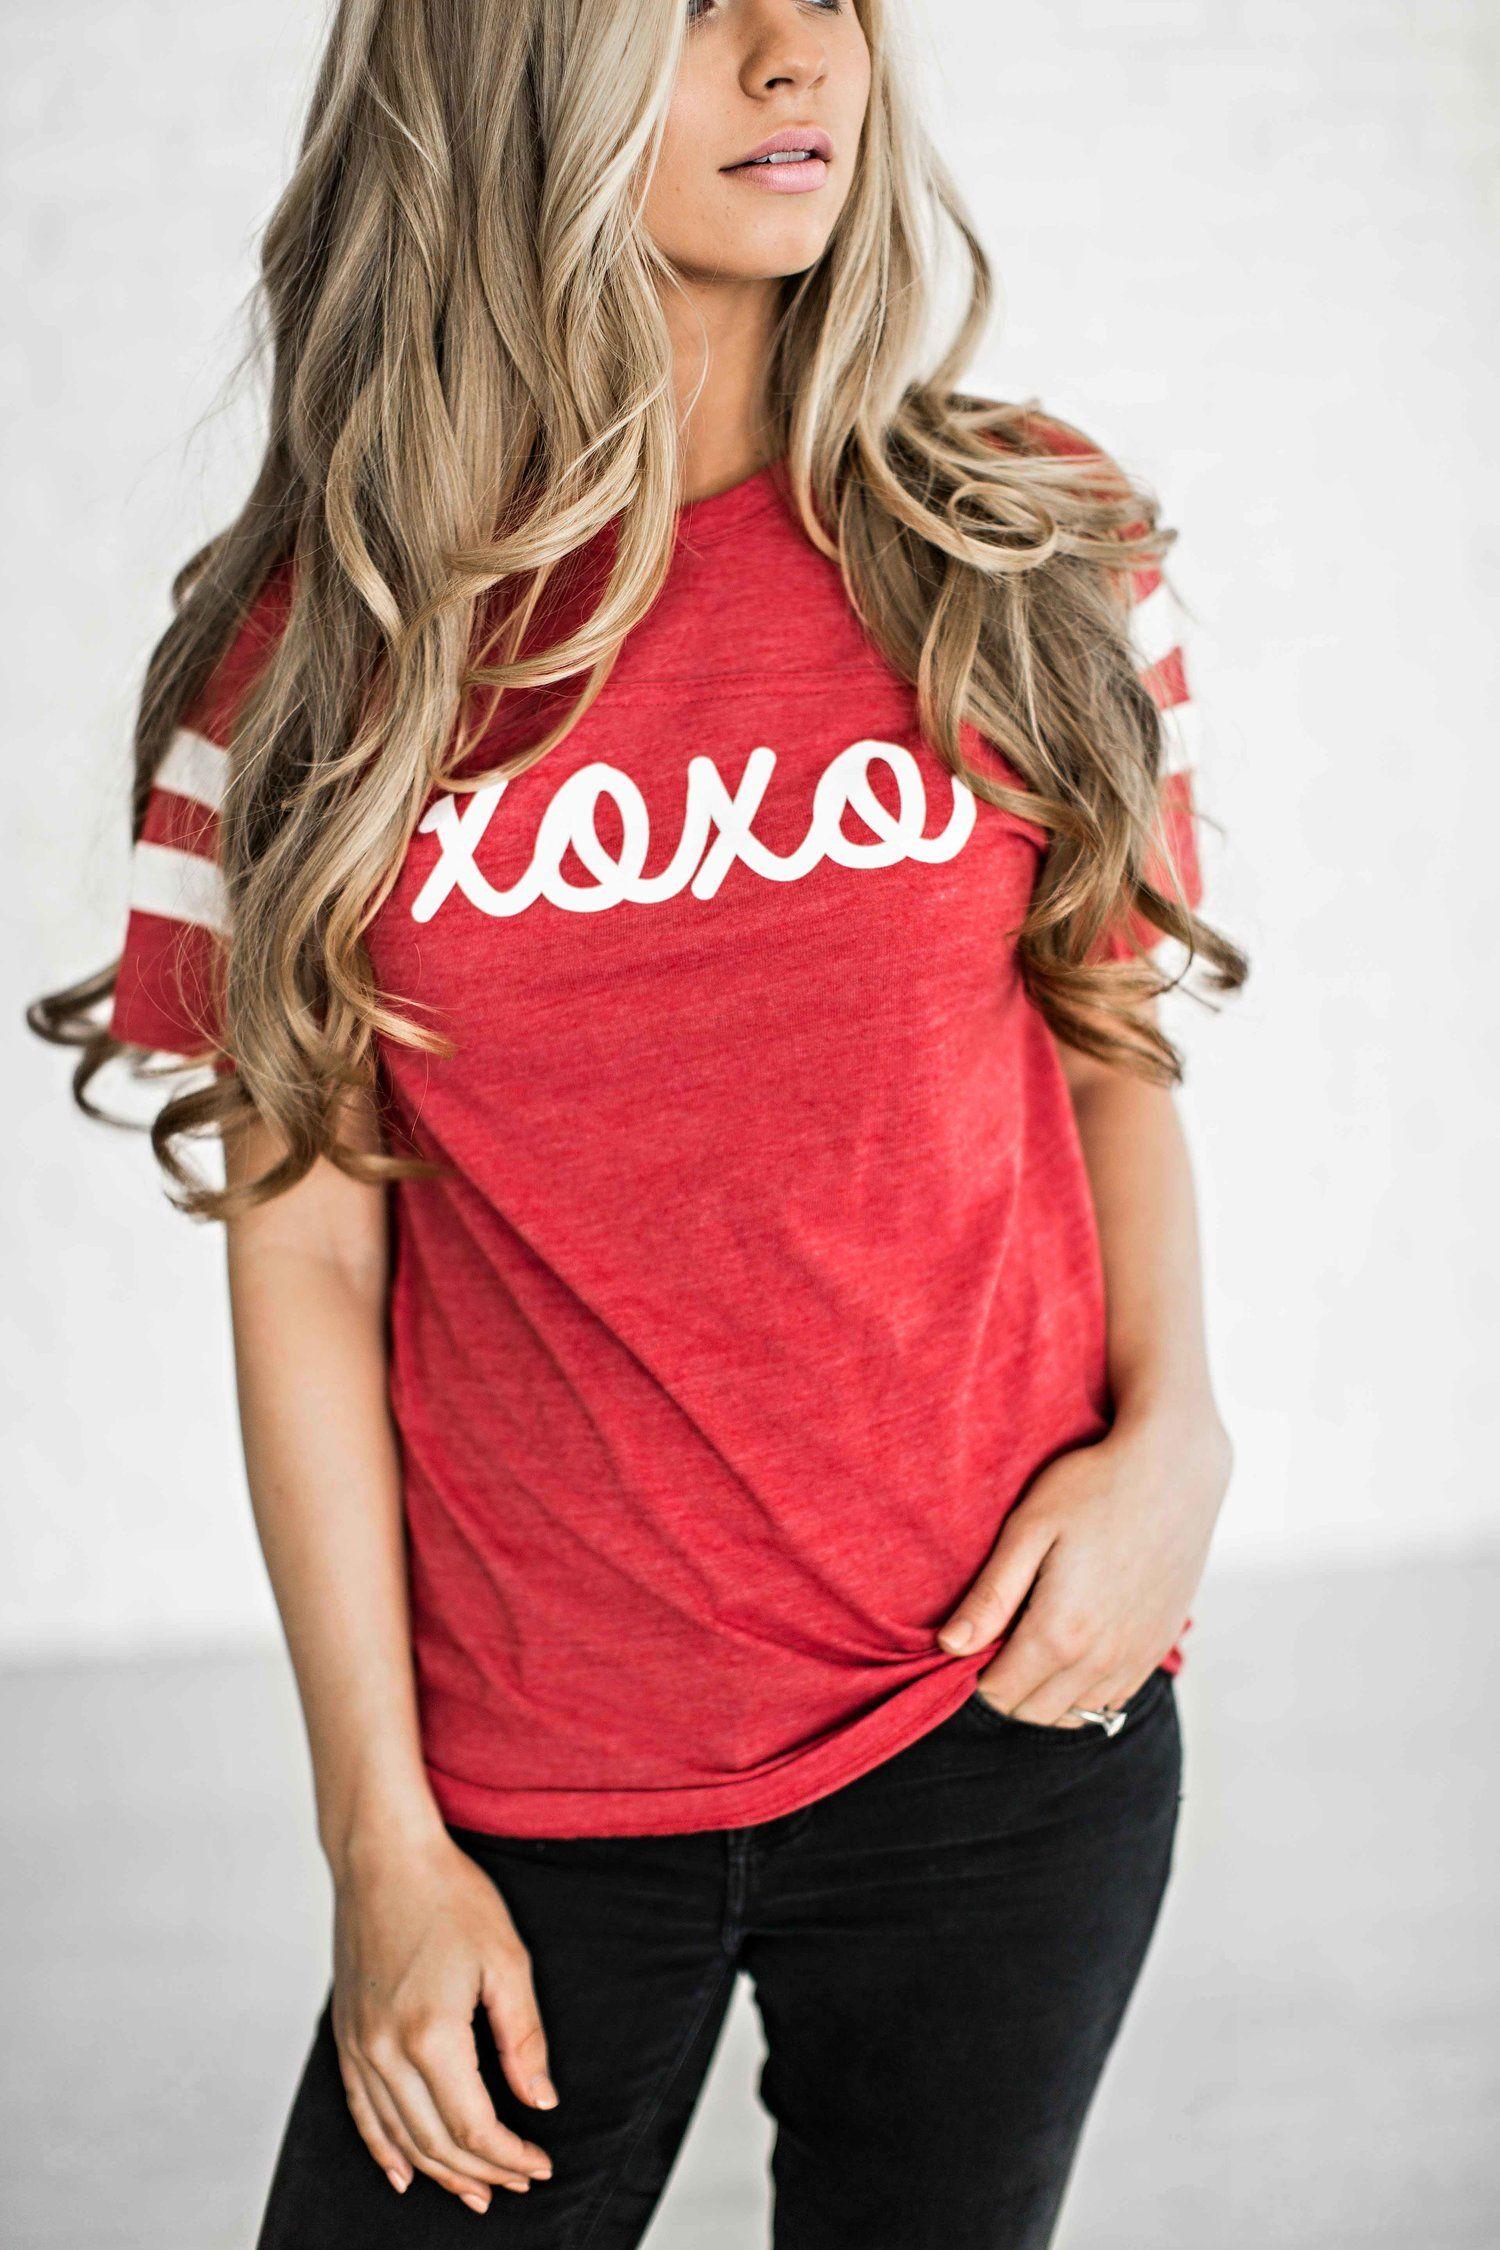 afc7f45c1 valentines, valentines apparel, valentines shirt, fashion, style, blonde,  ootd, shop, jessakae, wavy hair, hair, womens fashion, womens style, ...